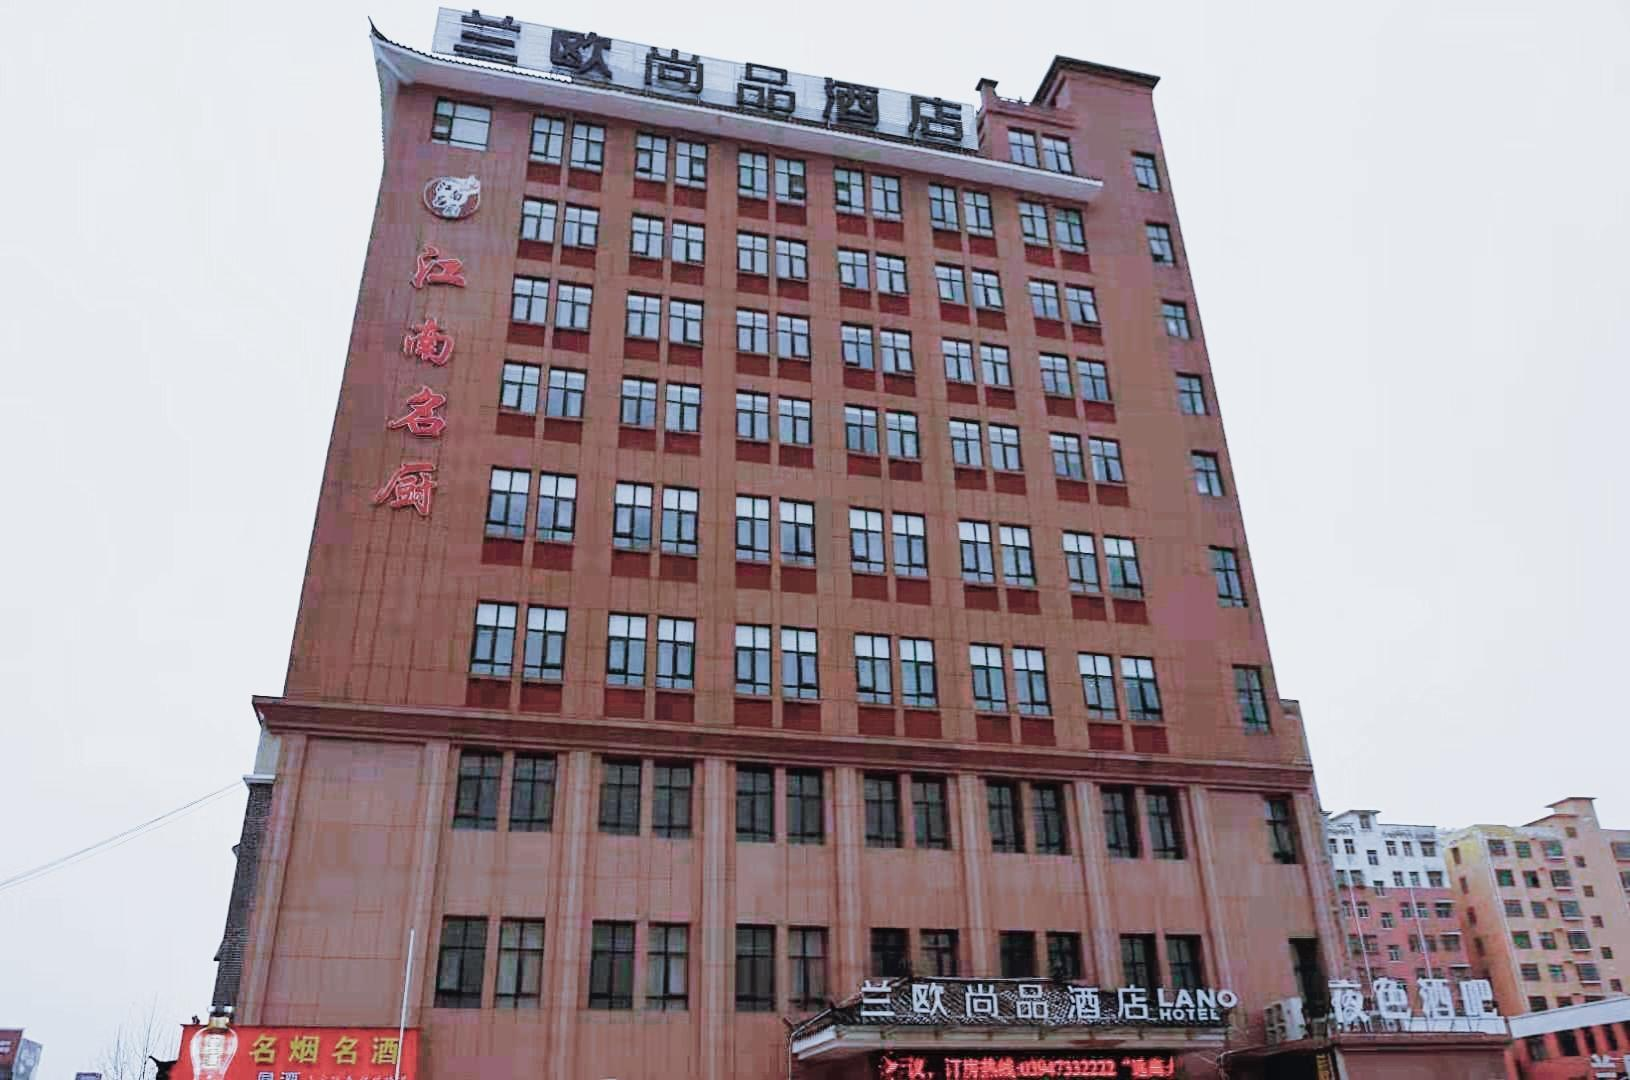 Lano Hotel Henan Luyi County Minglu Road